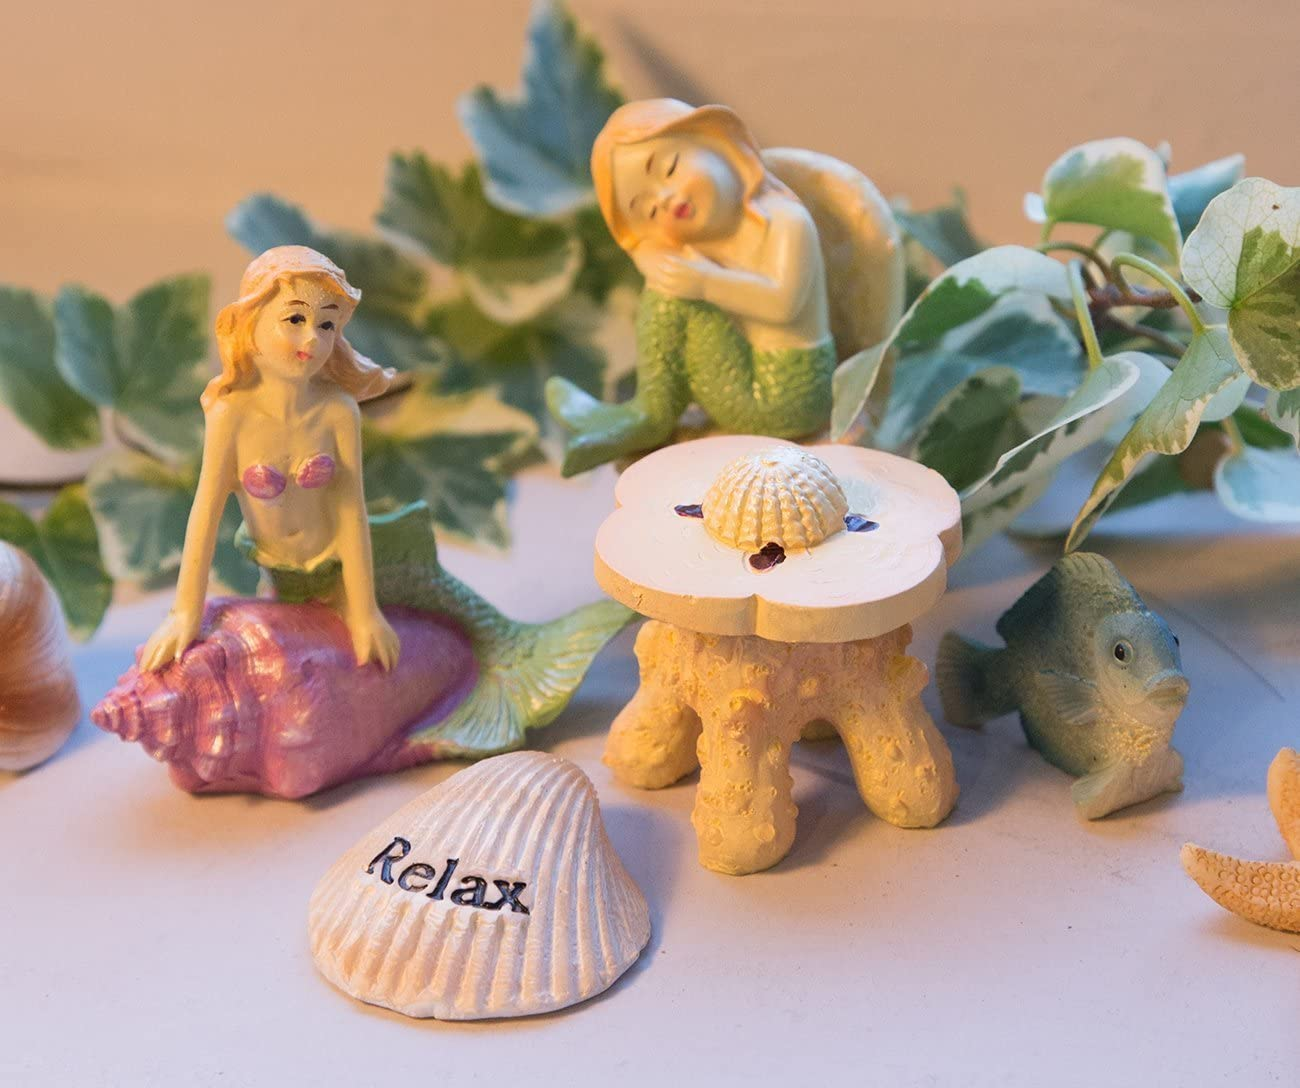 2 Sets Boat Miniature Figurine Garden Ornament Plant Fairy Decor Office XDS